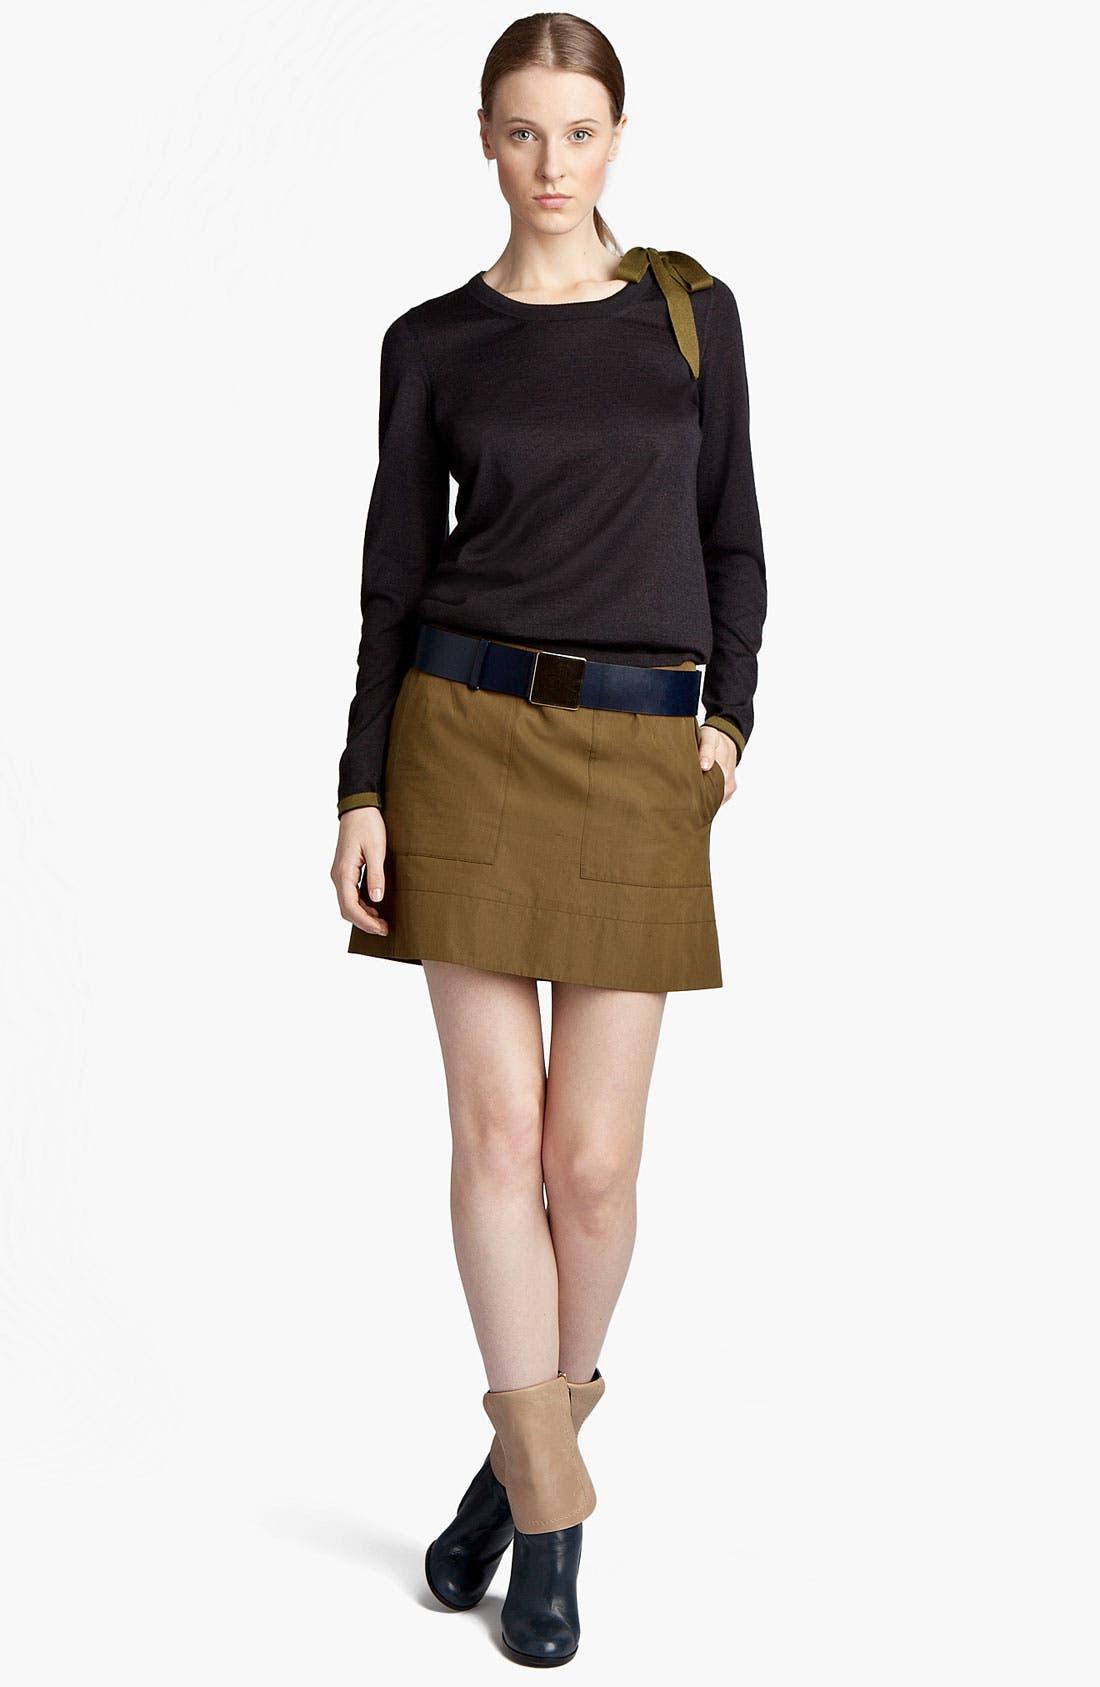 Alternate Image 1 Selected - Jil Sander Bow Detail Cashmere & Silk Sweater